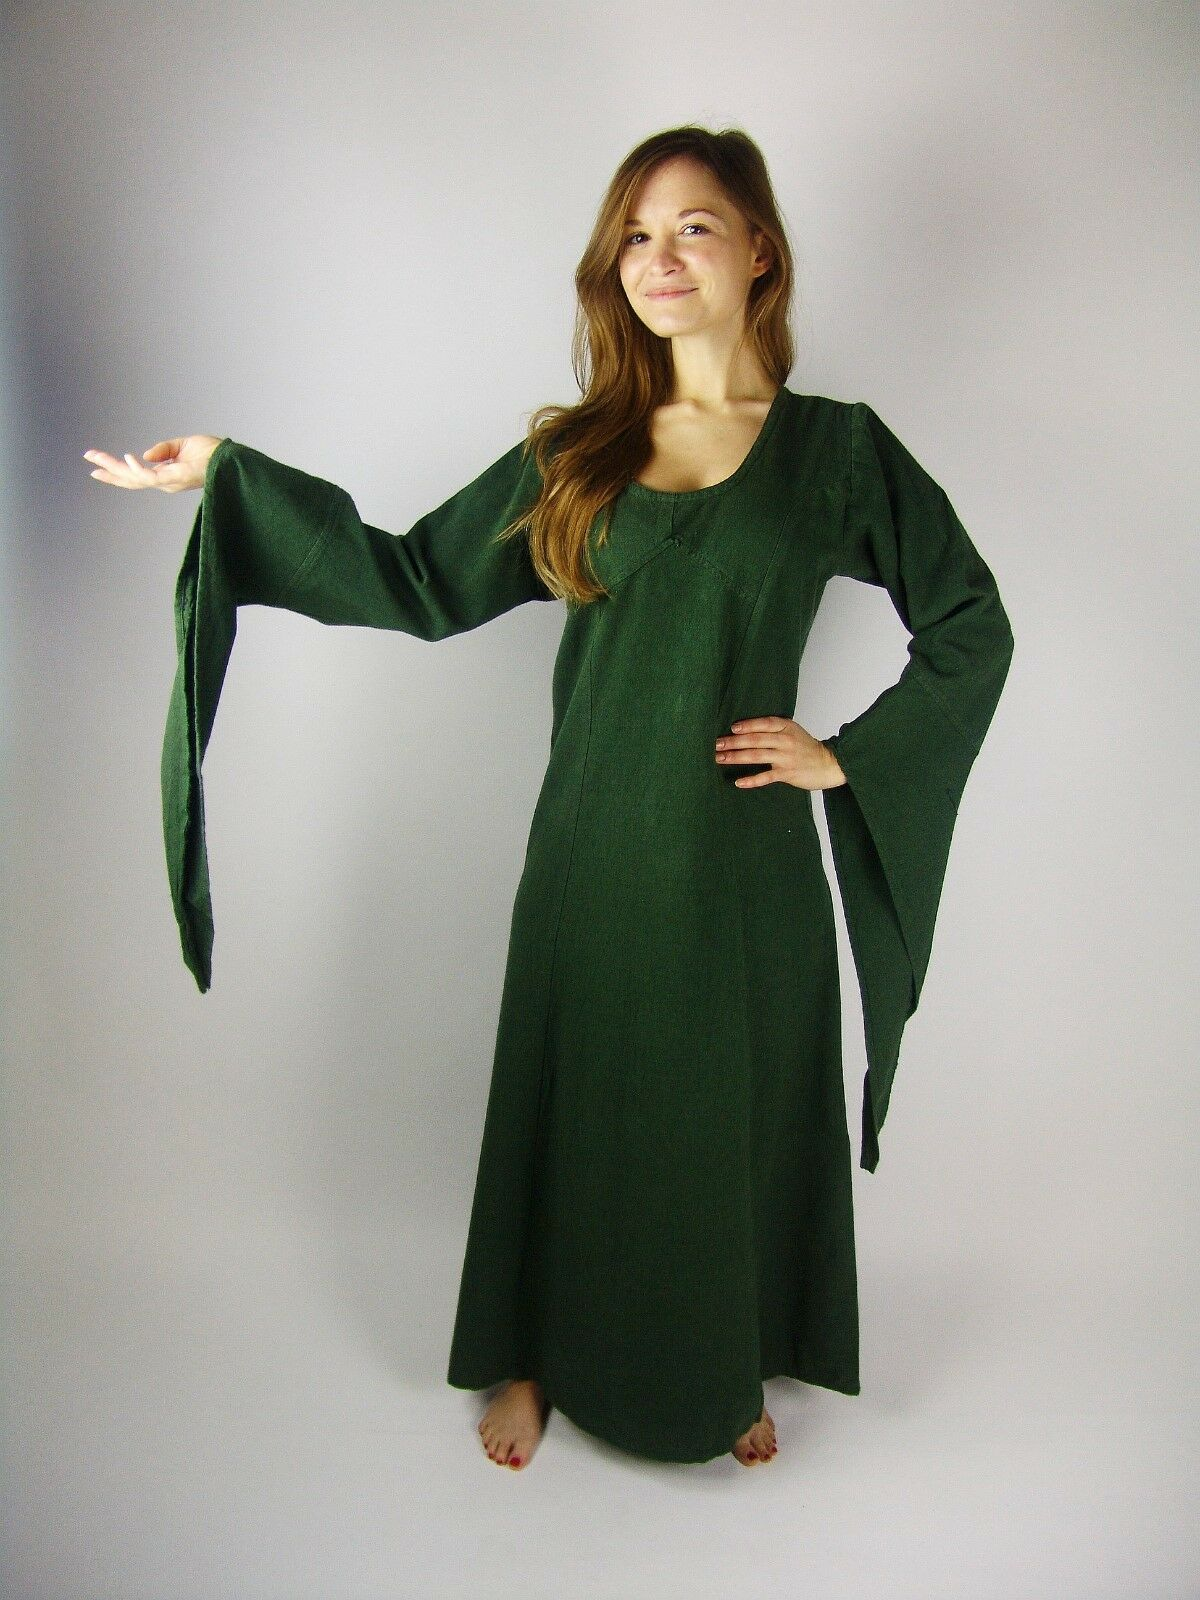 UNTERKLEID grün Kleid Mittelalter Gewandung Kostüm Larp S M L XL XXL XXXL Fee